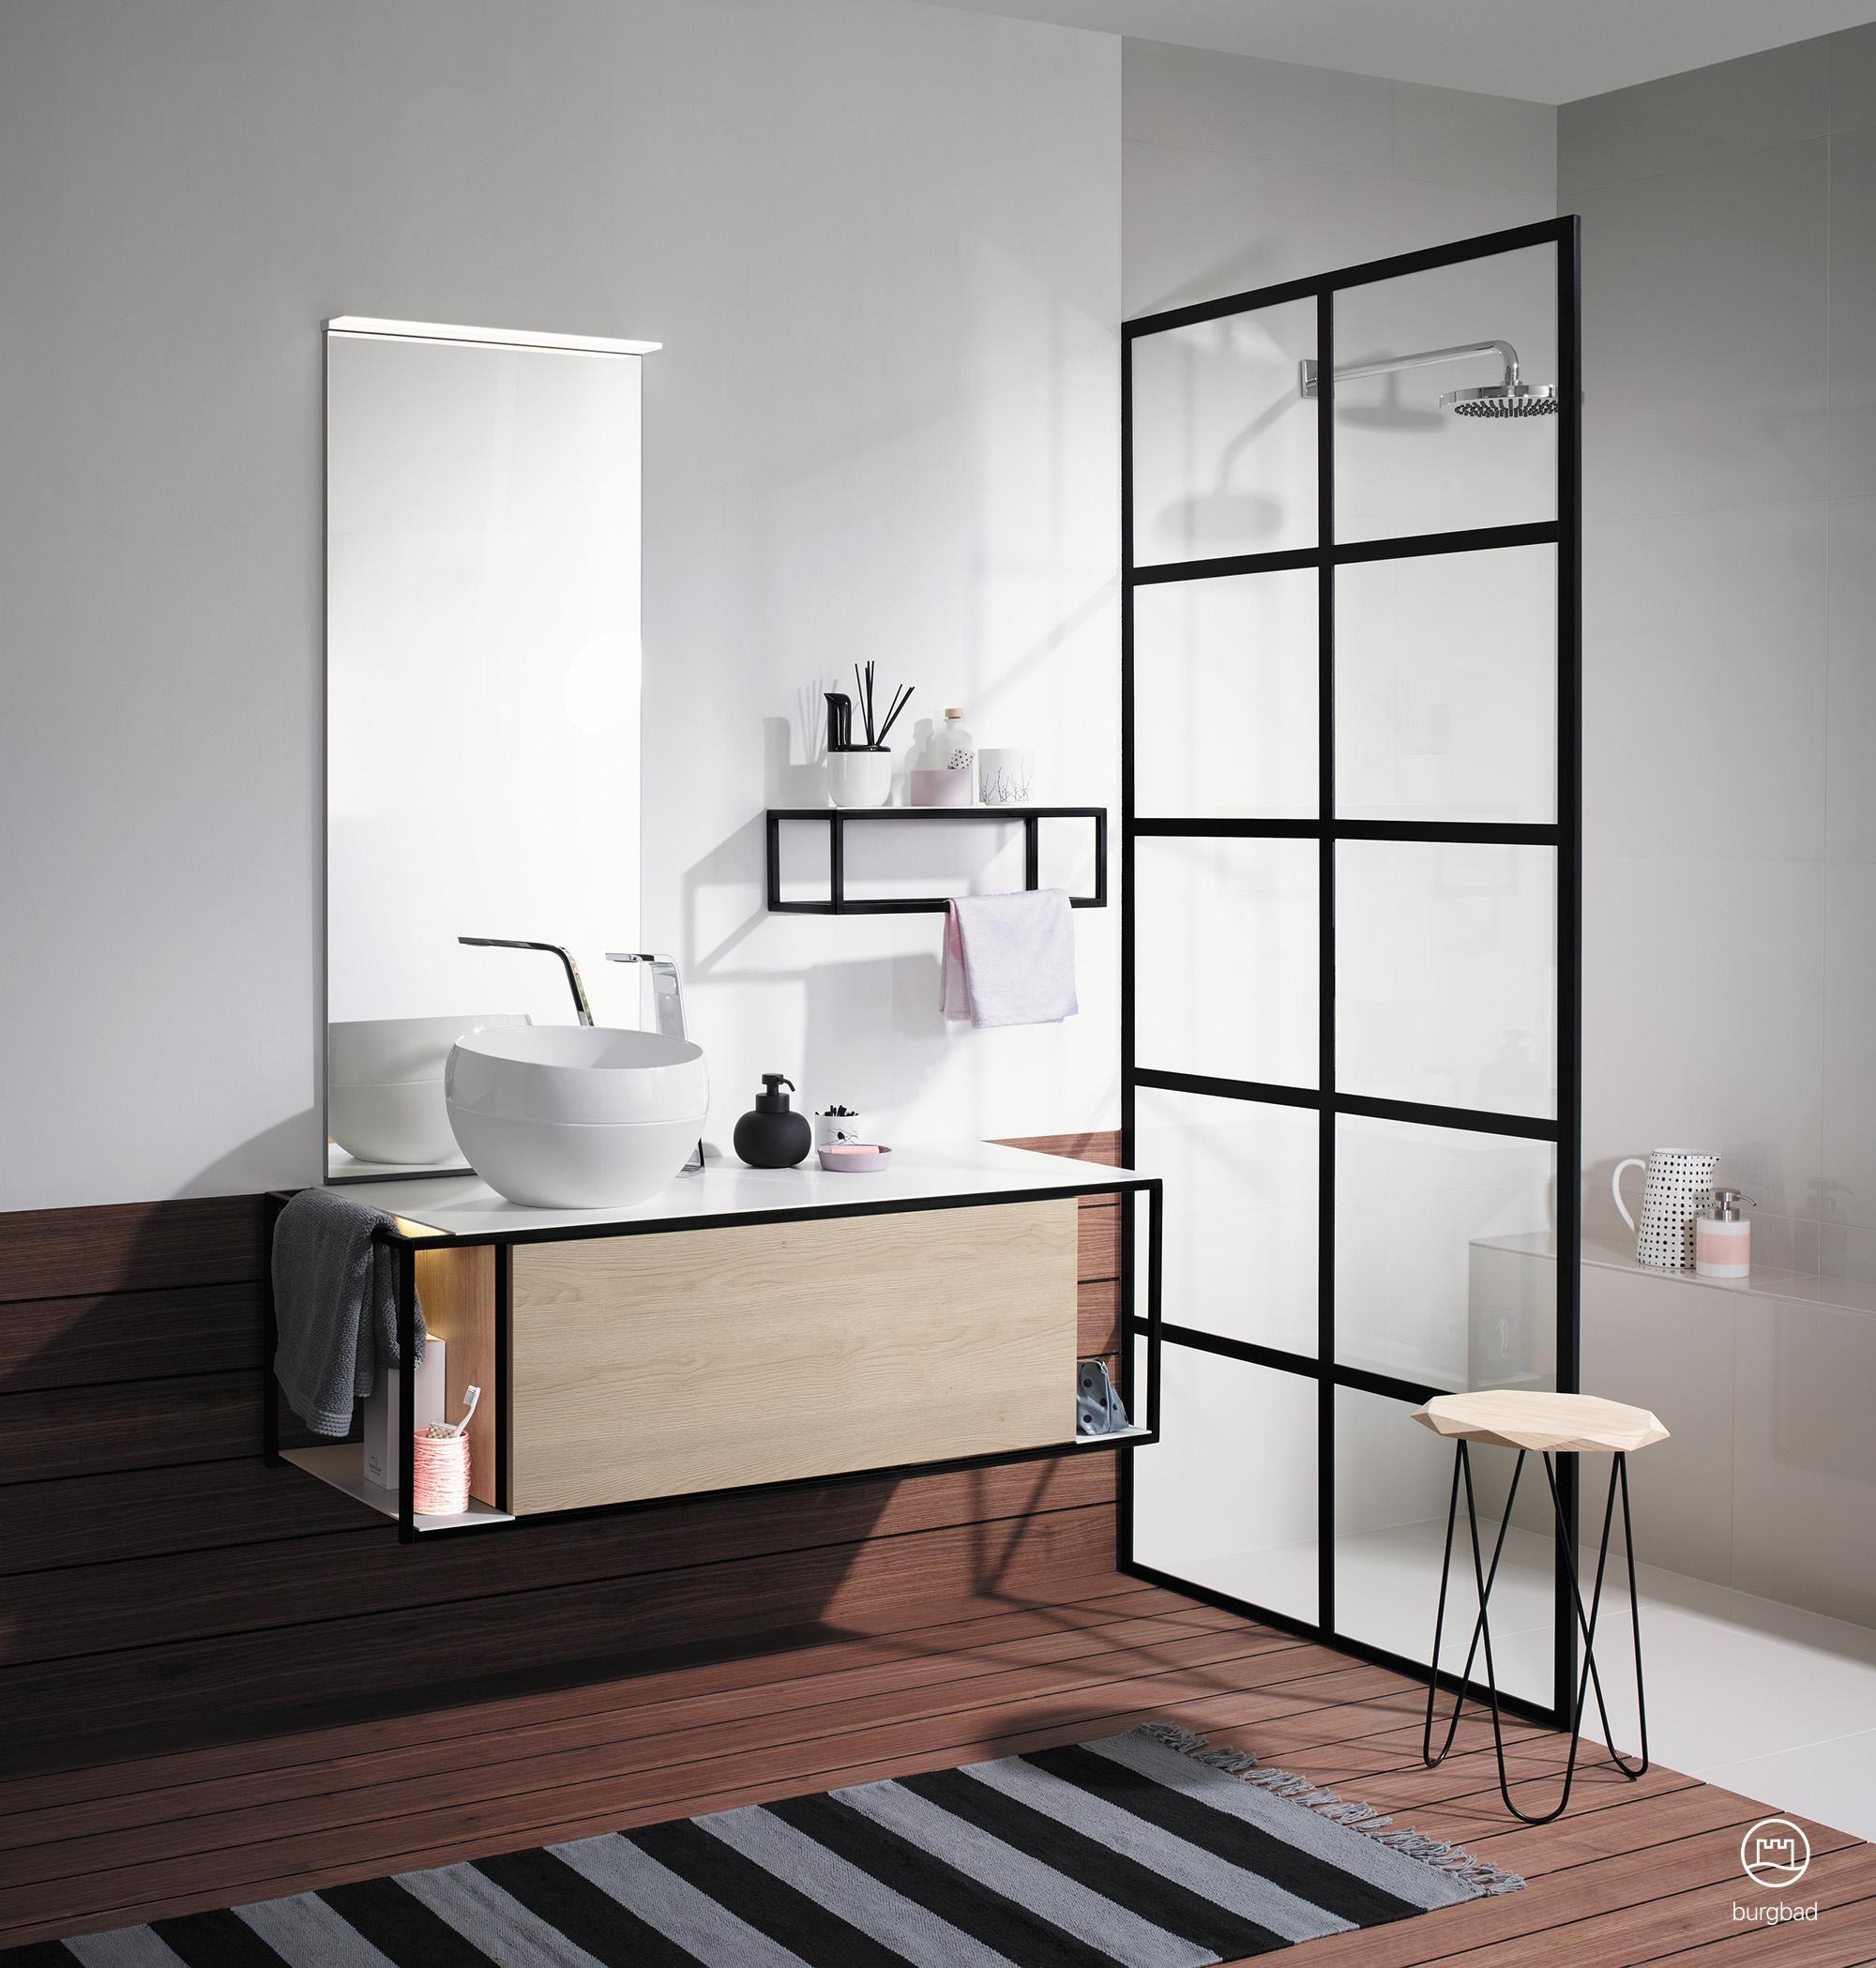 Modernes Badmobel Set Junit Von Burgbad Badezimmer In 2020 Modernes Badezimmerdesign Badezimmer Innenausstattung Moderne Badmobel